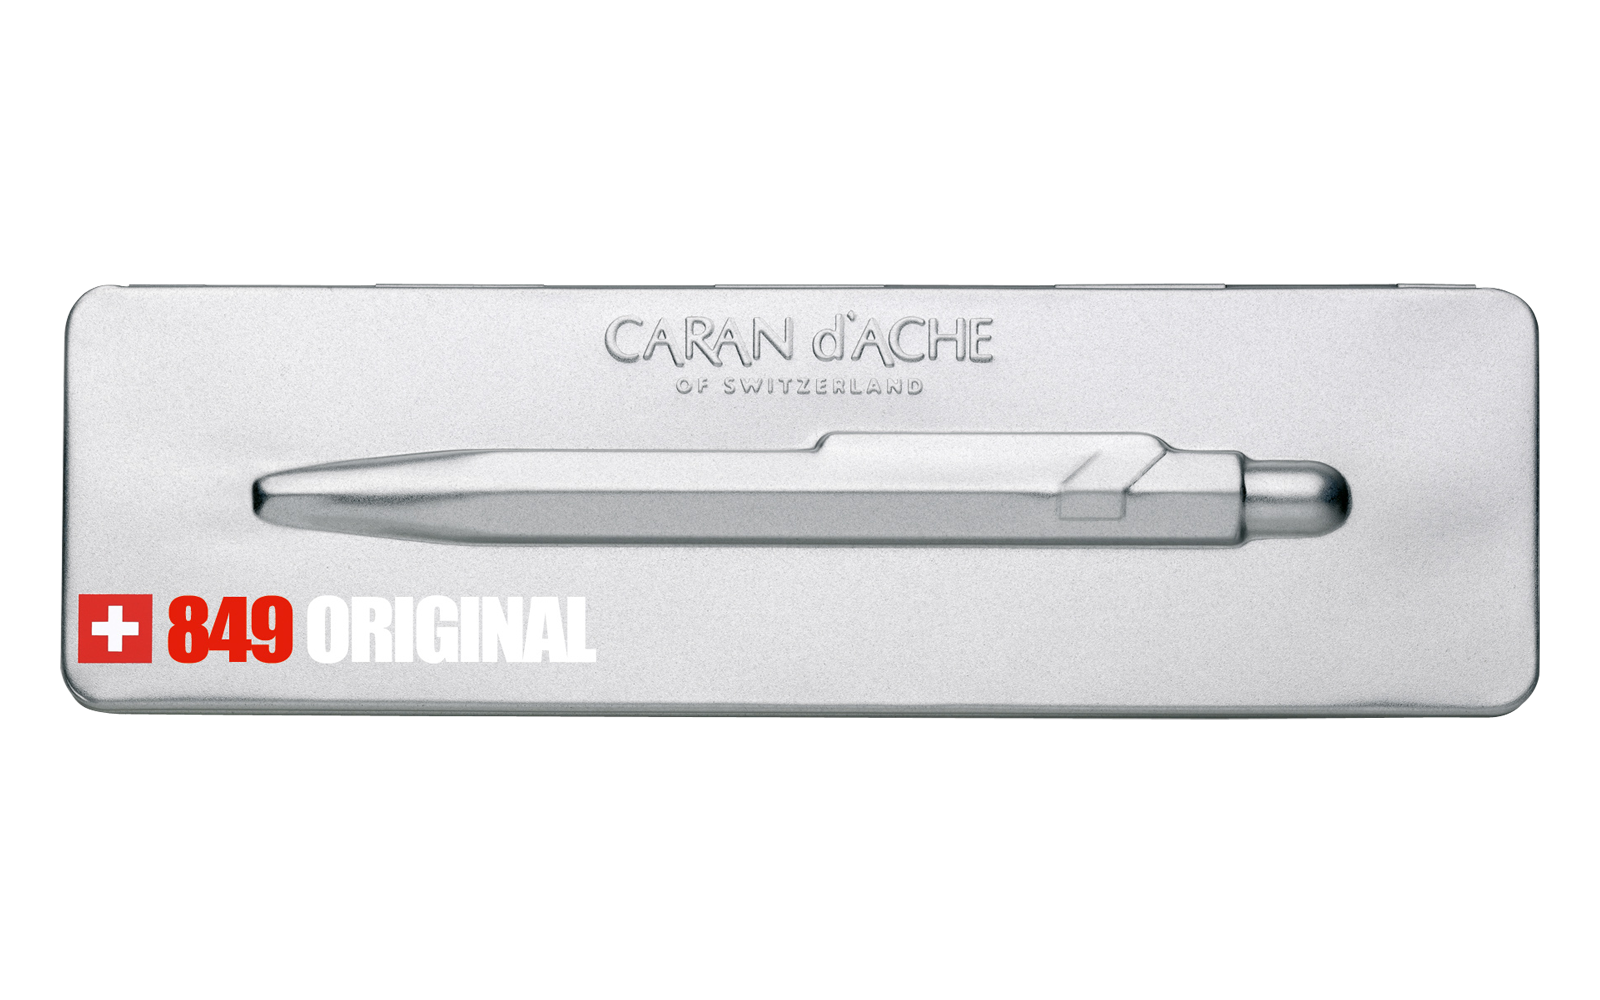 Carandache Office 849 Original - шариковая ручка, M